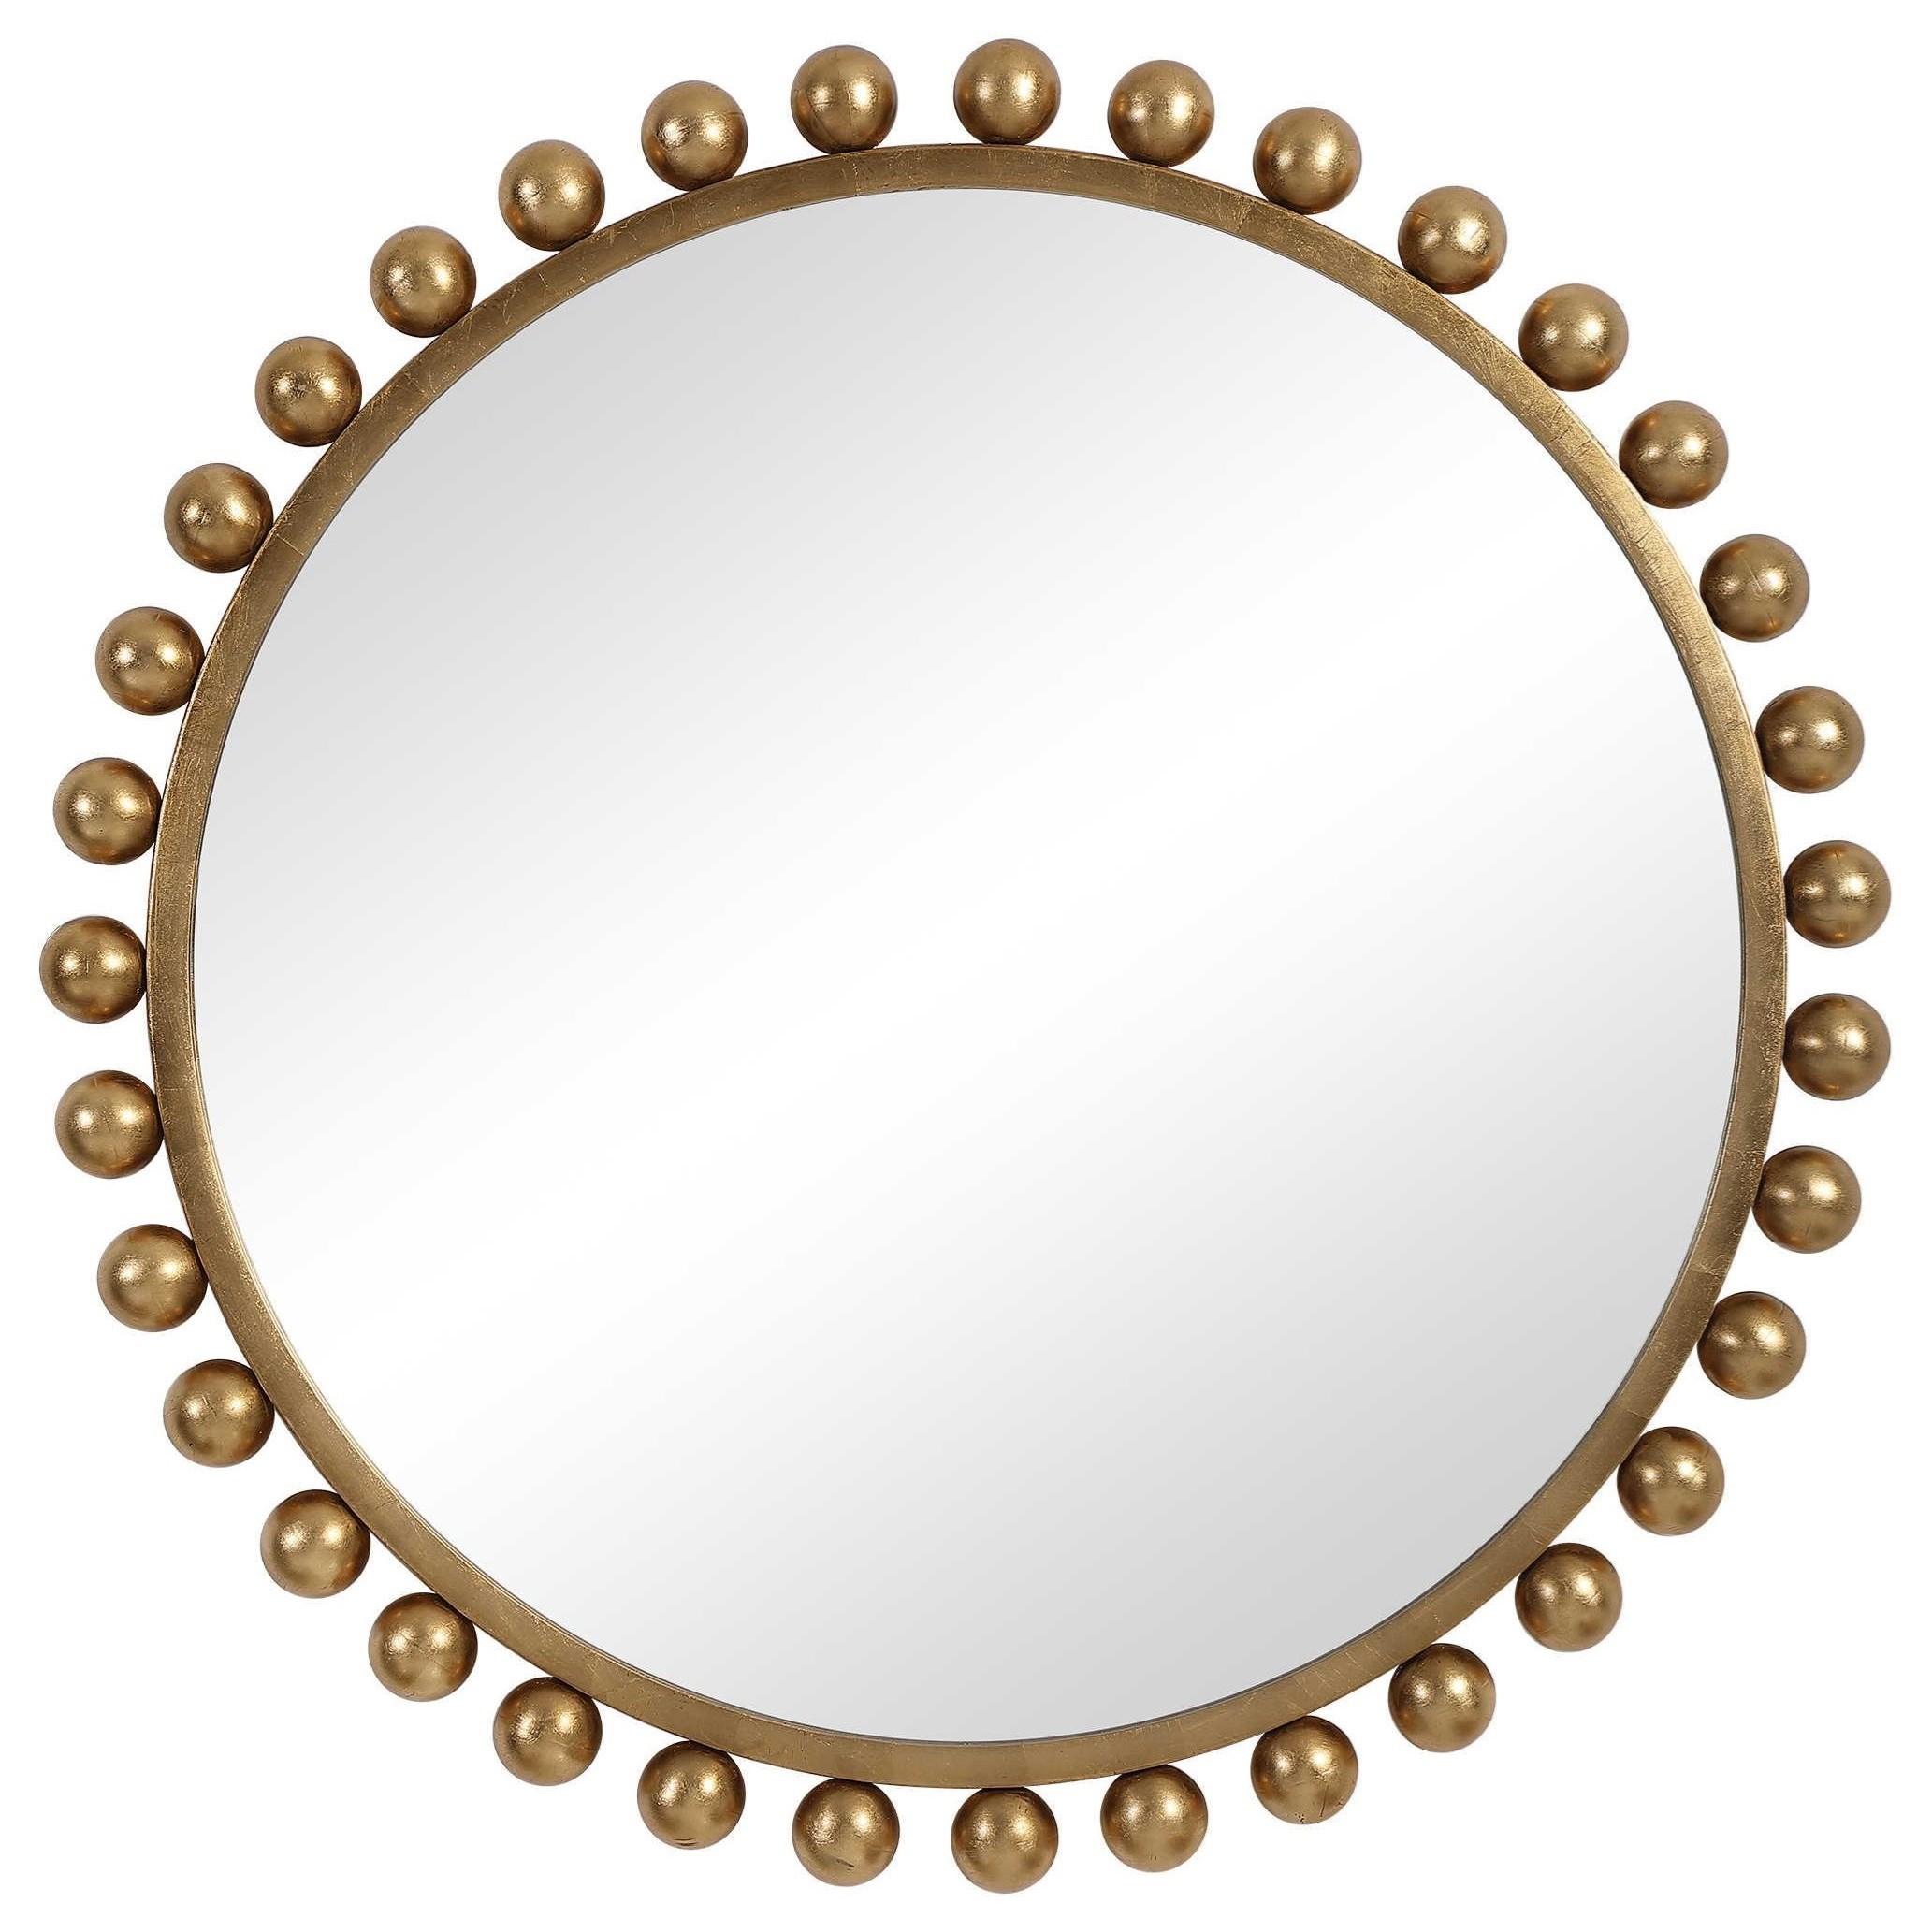 Mirrors - Round Cyra Gold Round Mirror by Uttermost at Miller Waldrop Furniture and Decor